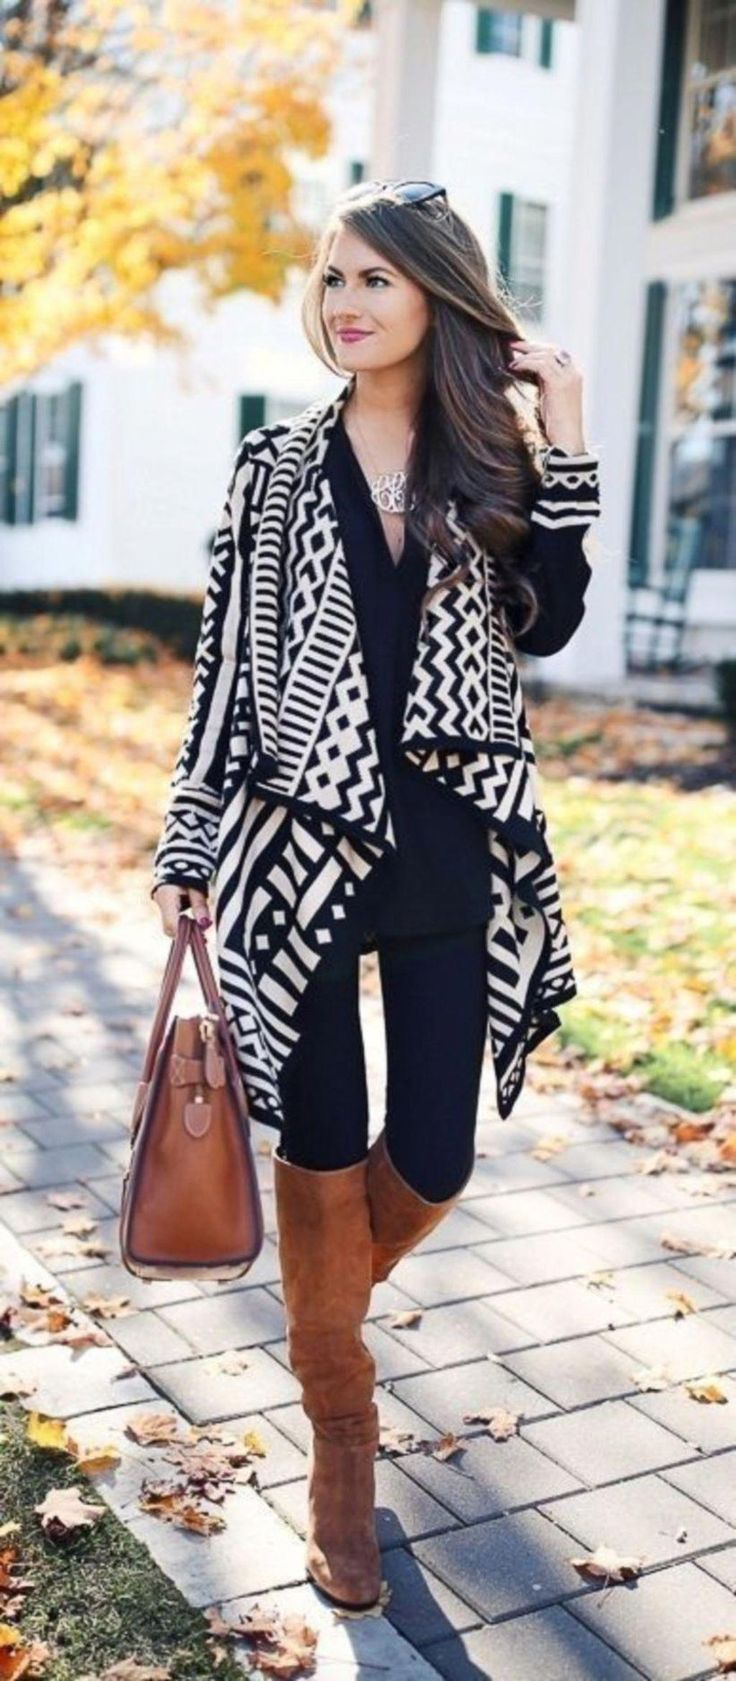 womens business casual work outfits #WOMENWORKOUTFITS #Women #Fashion